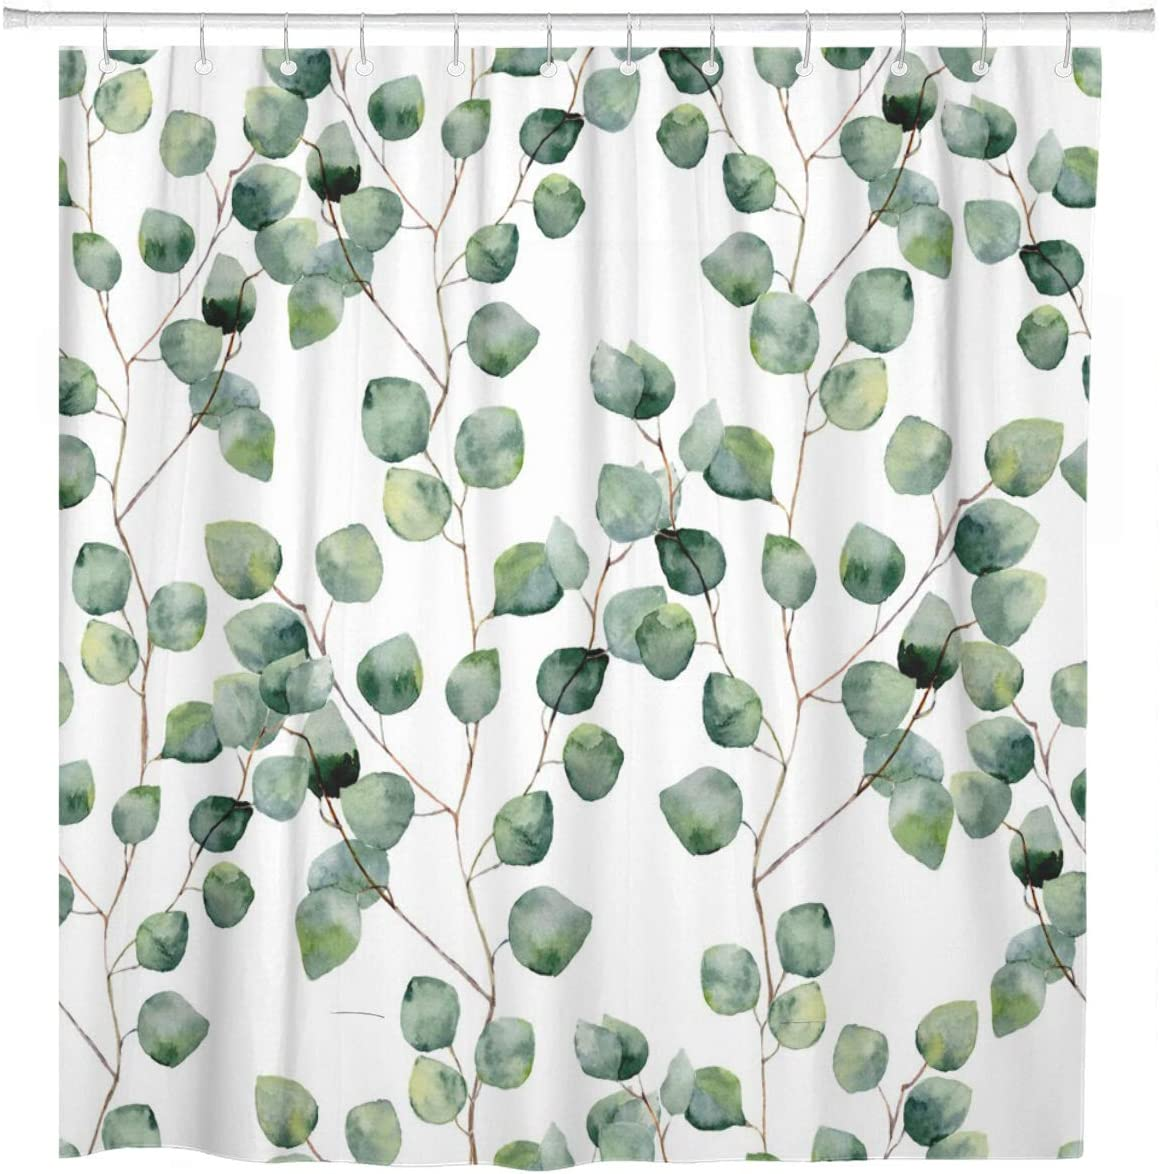 ArtSocket Award-winning store Shower Ranking integrated 1st place Curtain Watercolor Green Floral Roun Eucalyptus